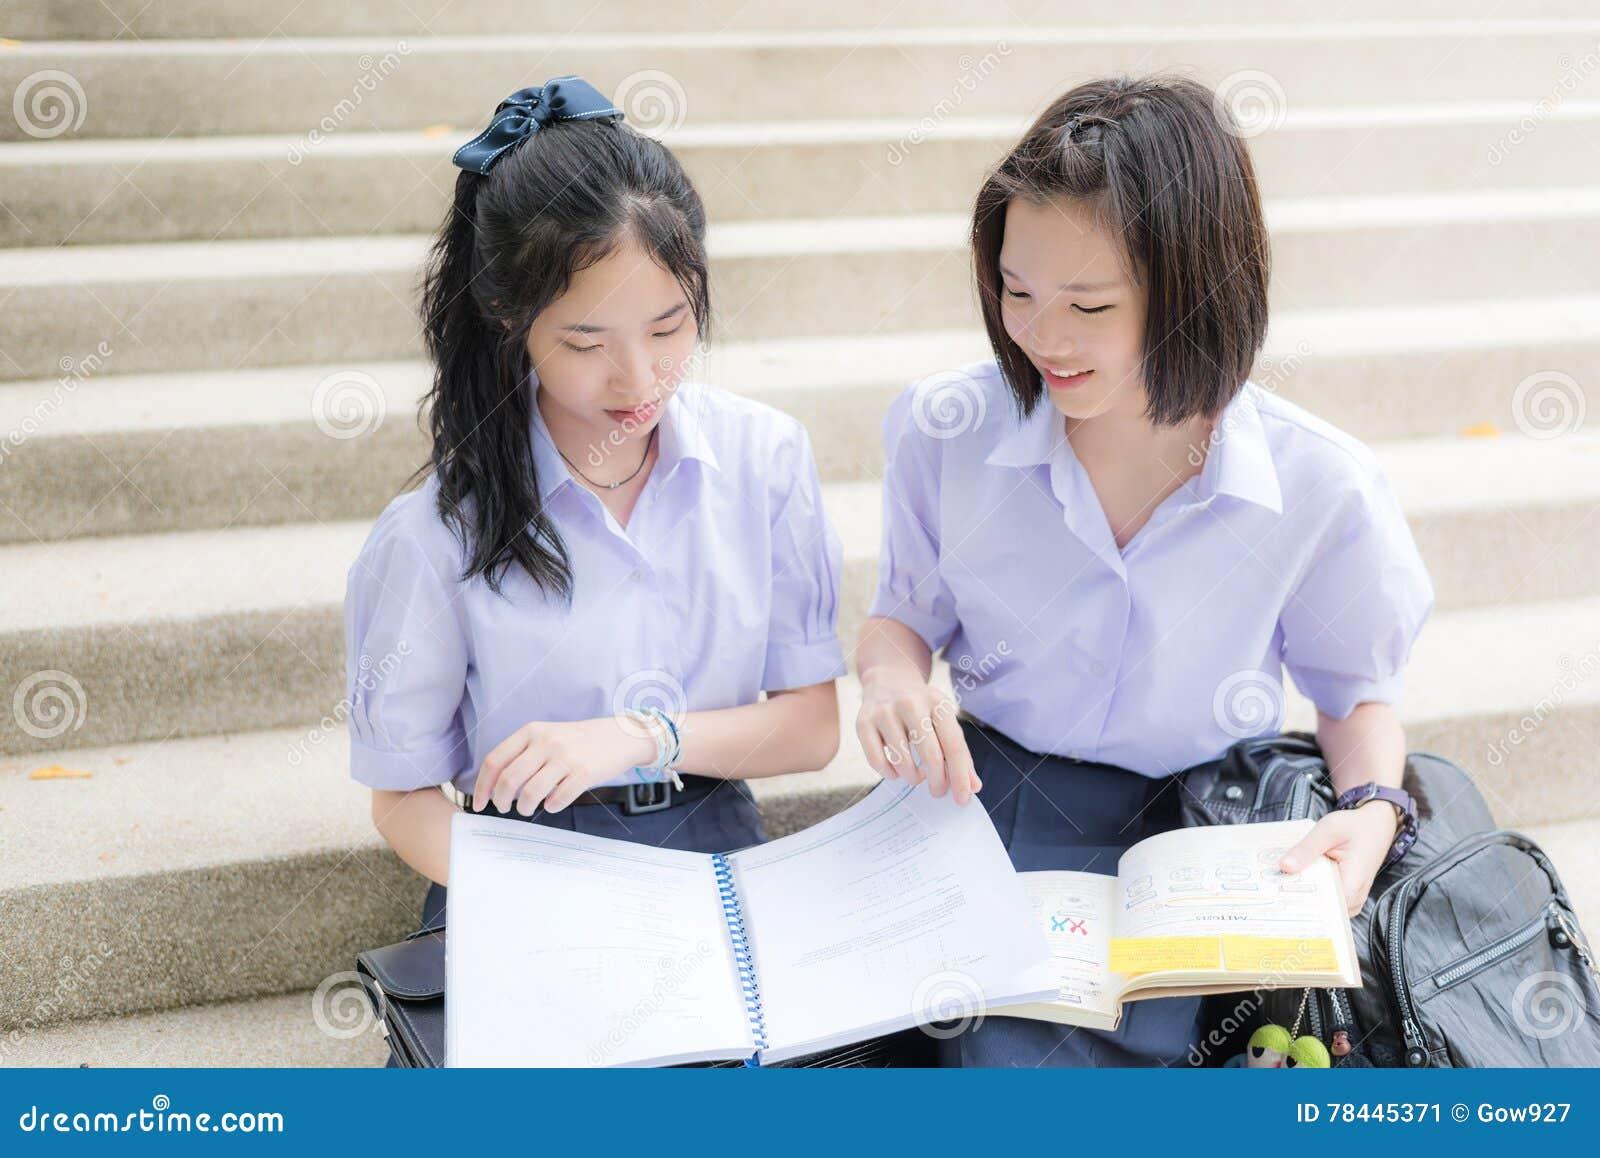 Cute Asian Thai high schoolgirls student couple studying in school